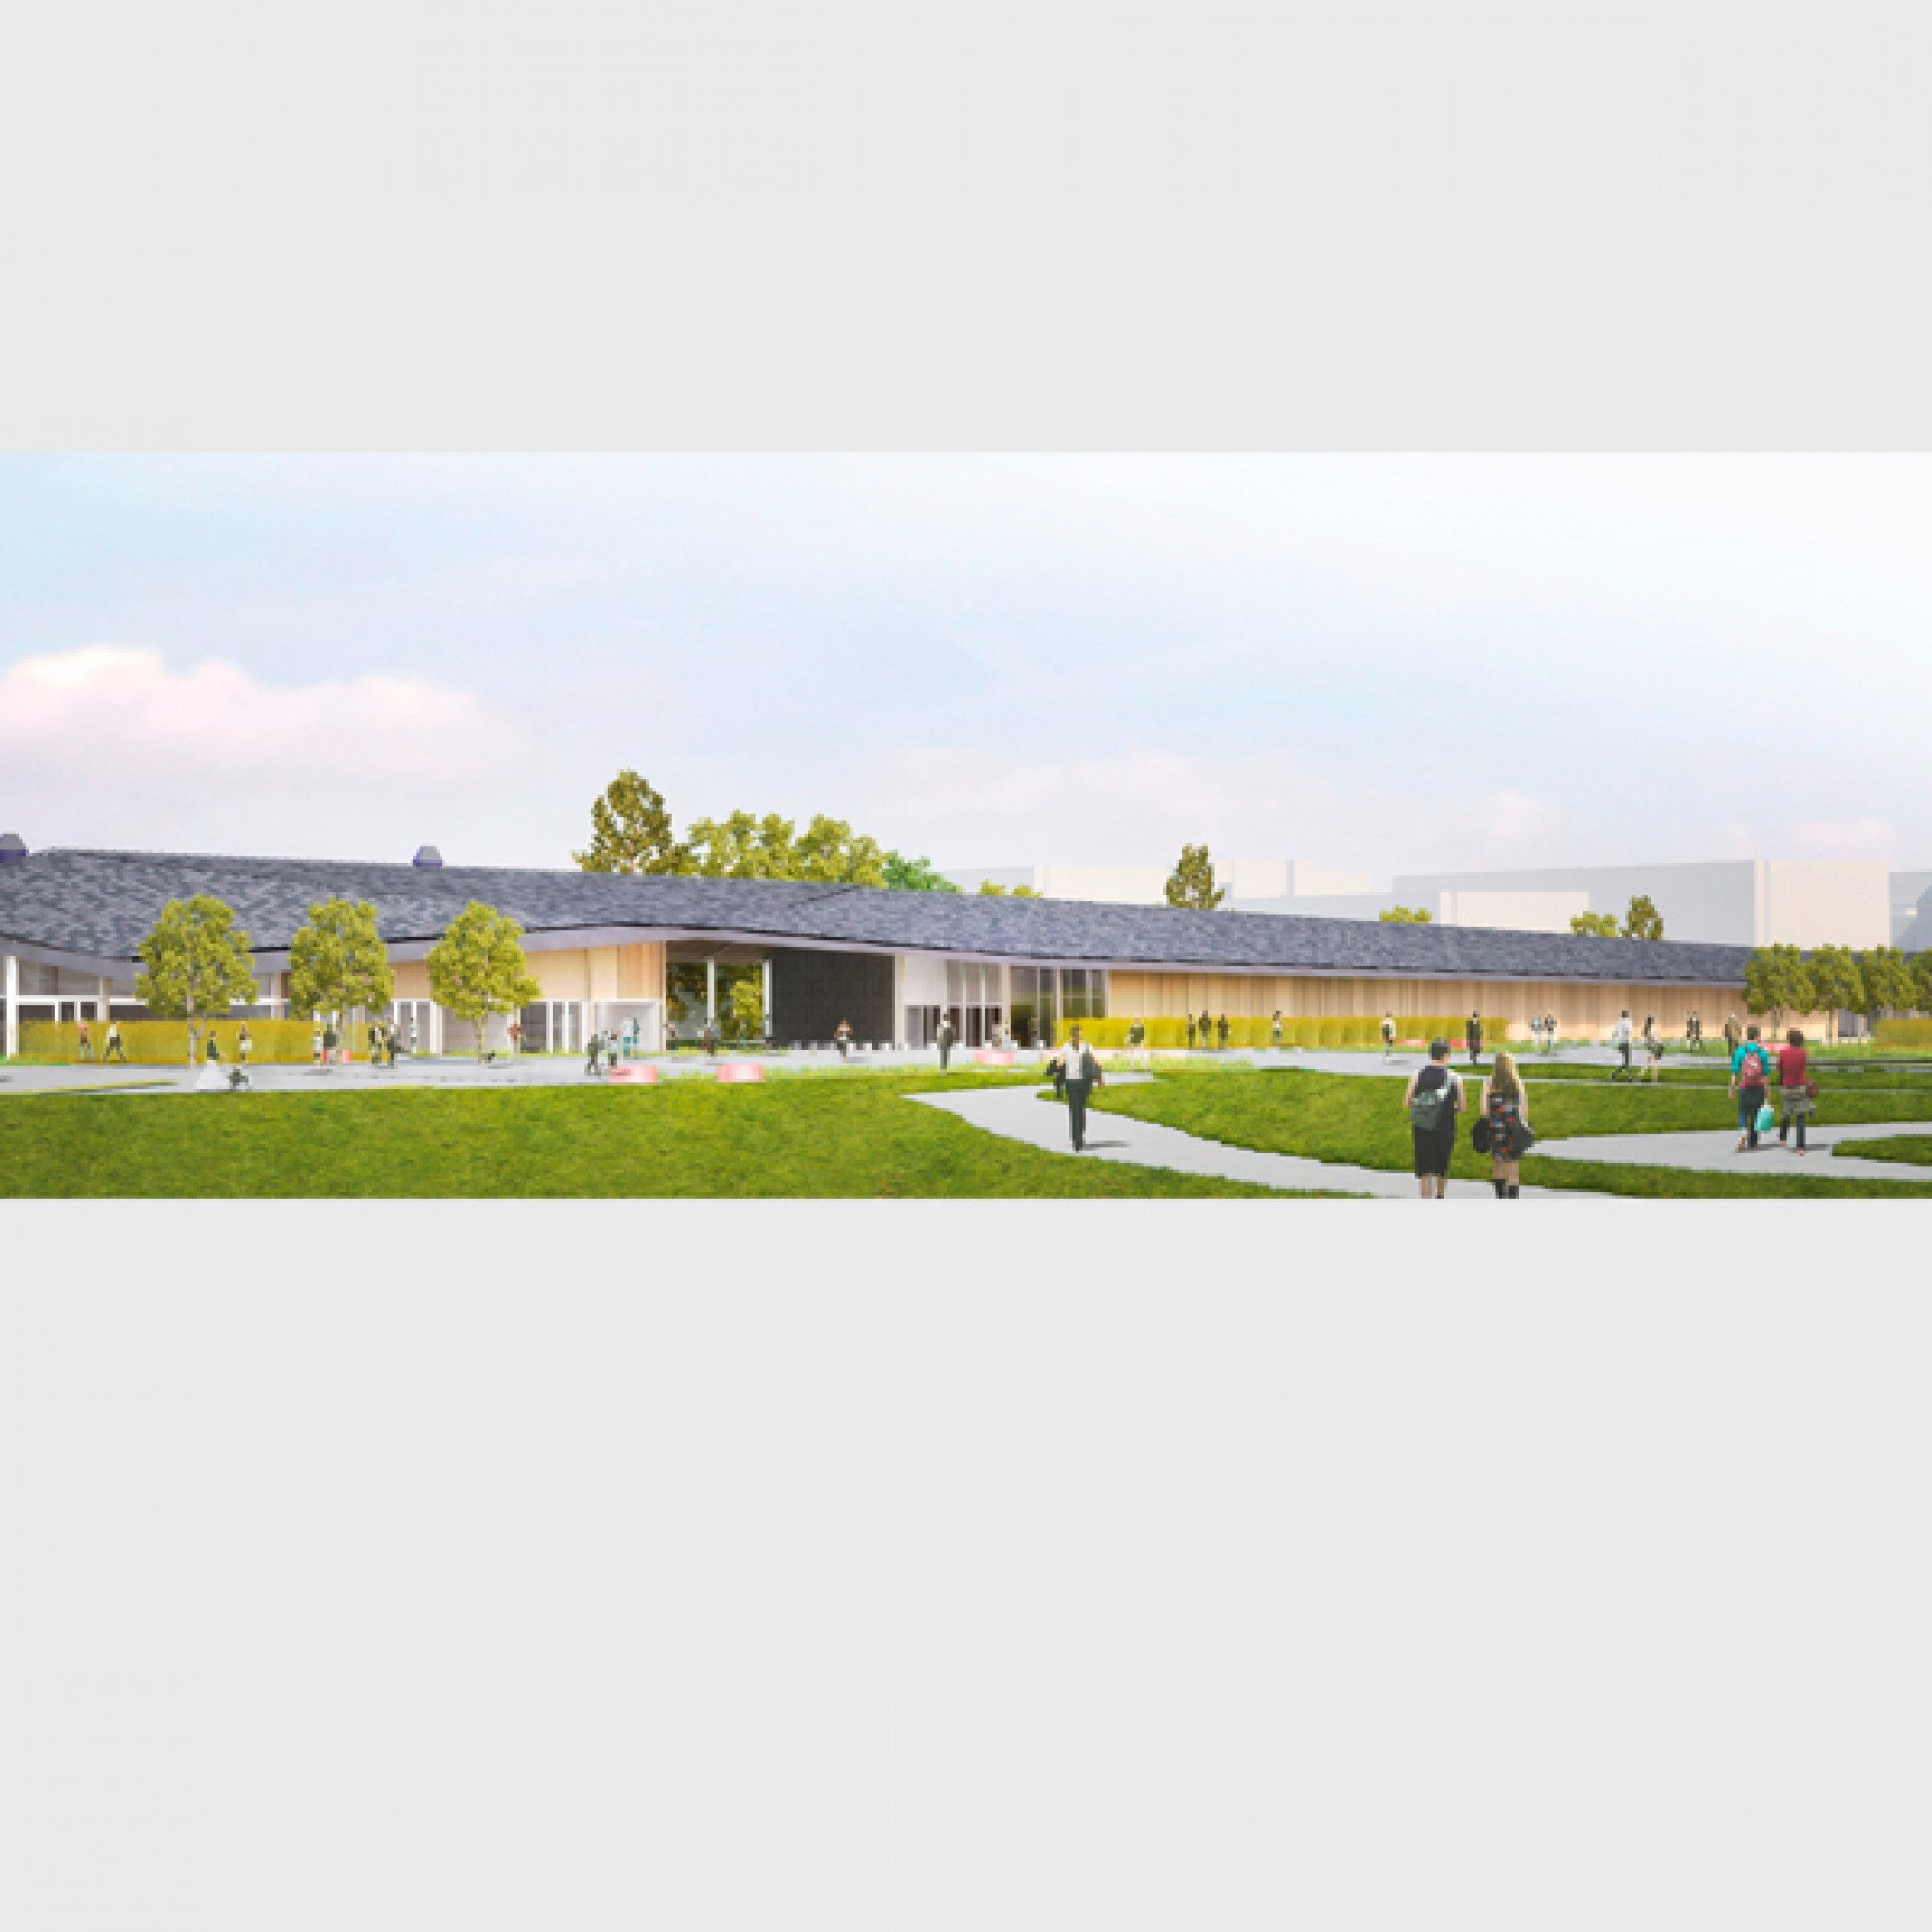 Zum Pavillon gehören Grünflächen, ... (EPFL)